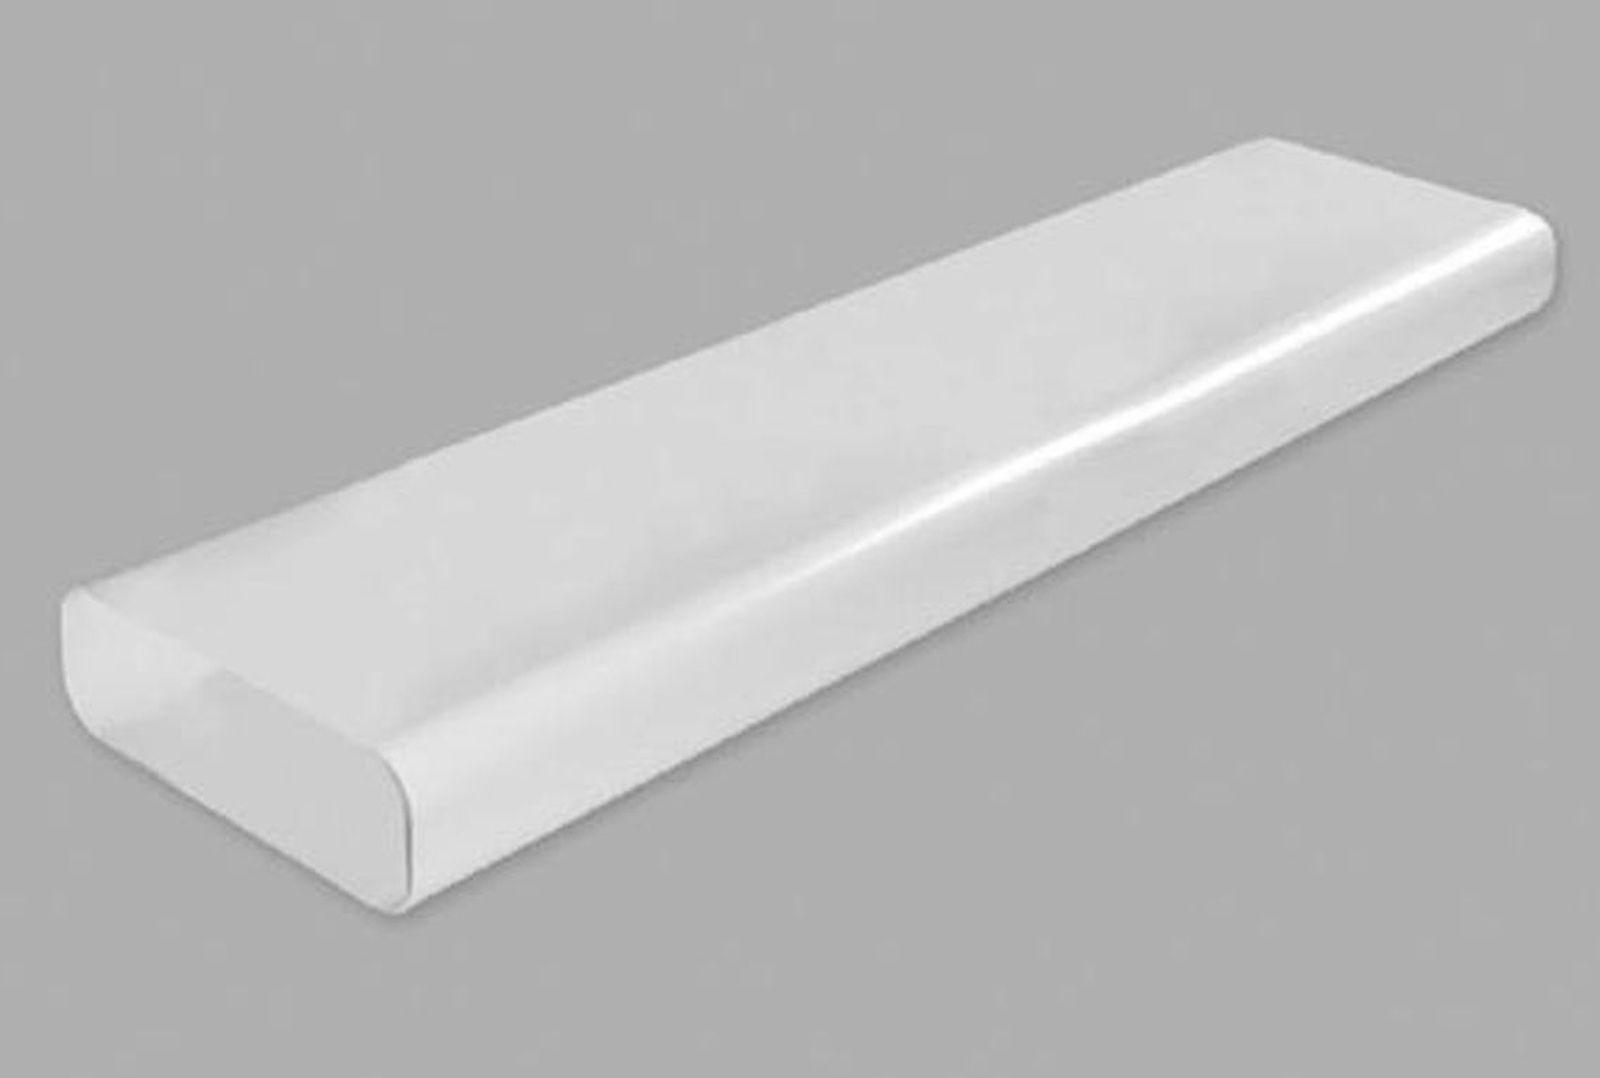 Abluft flachkanal 230 x 80 mm vierkantrohr 100 cm dunstabzug